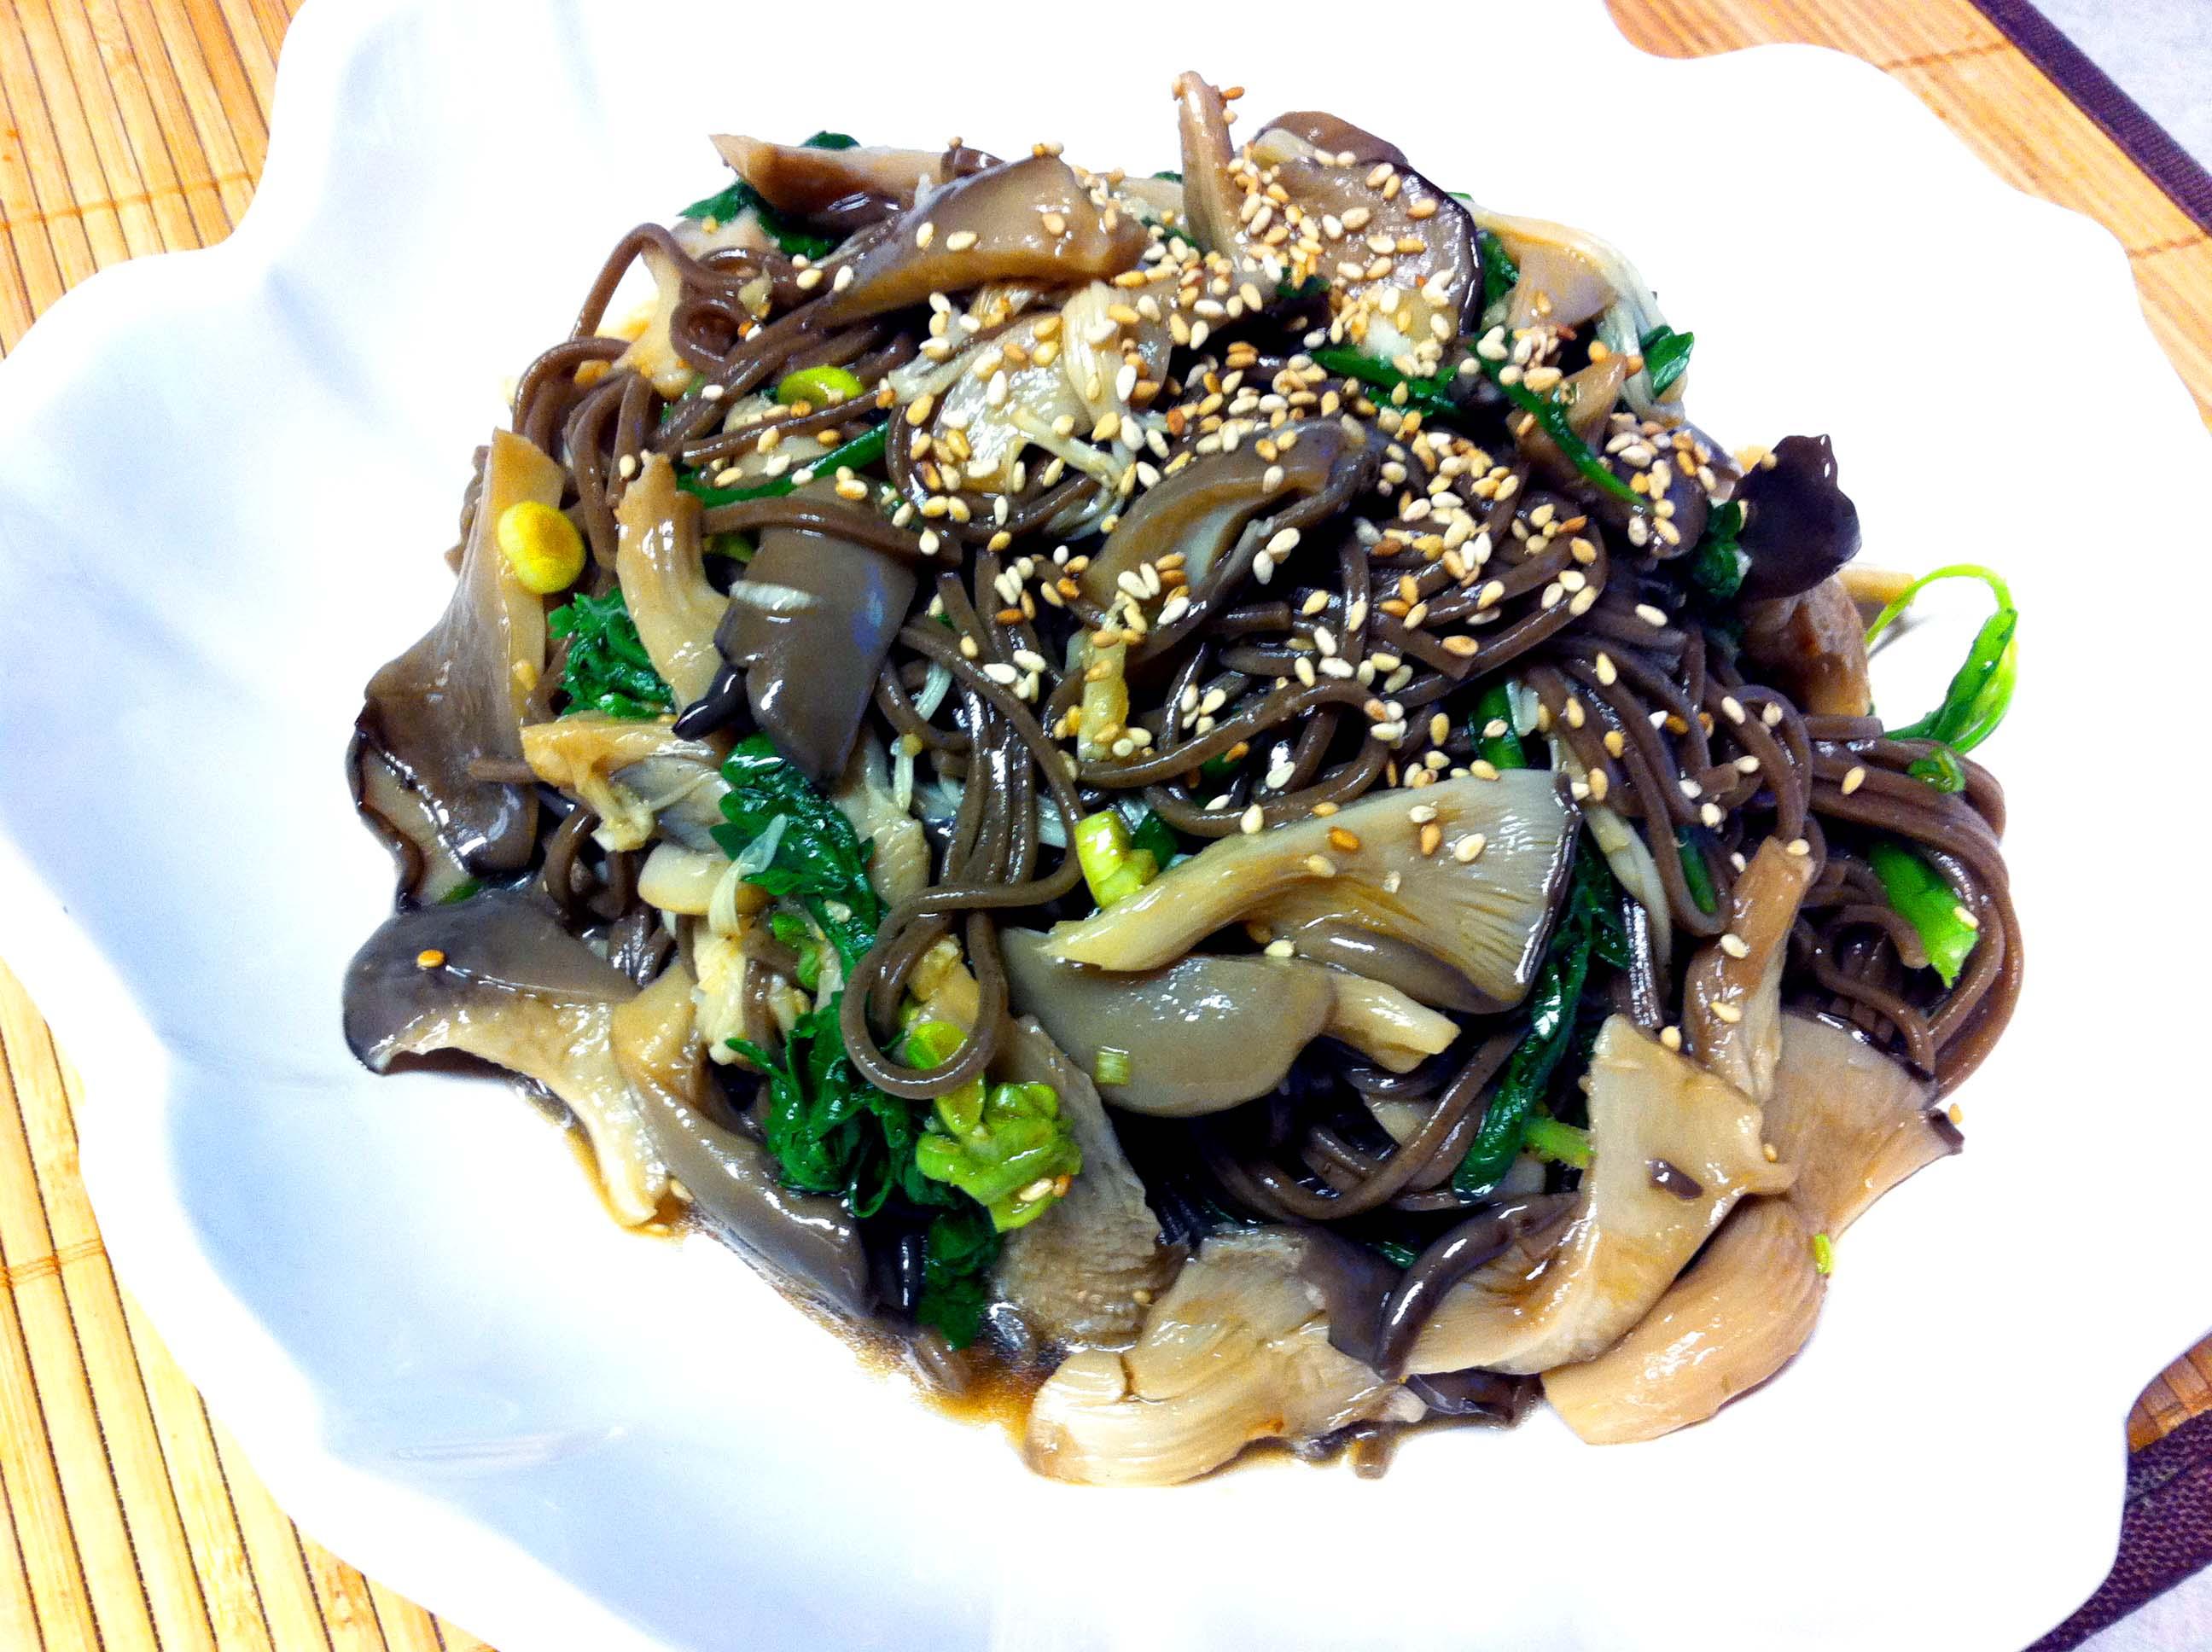 Vegetarian Recipe- Vegetarian Buckwheat Noodle Salad